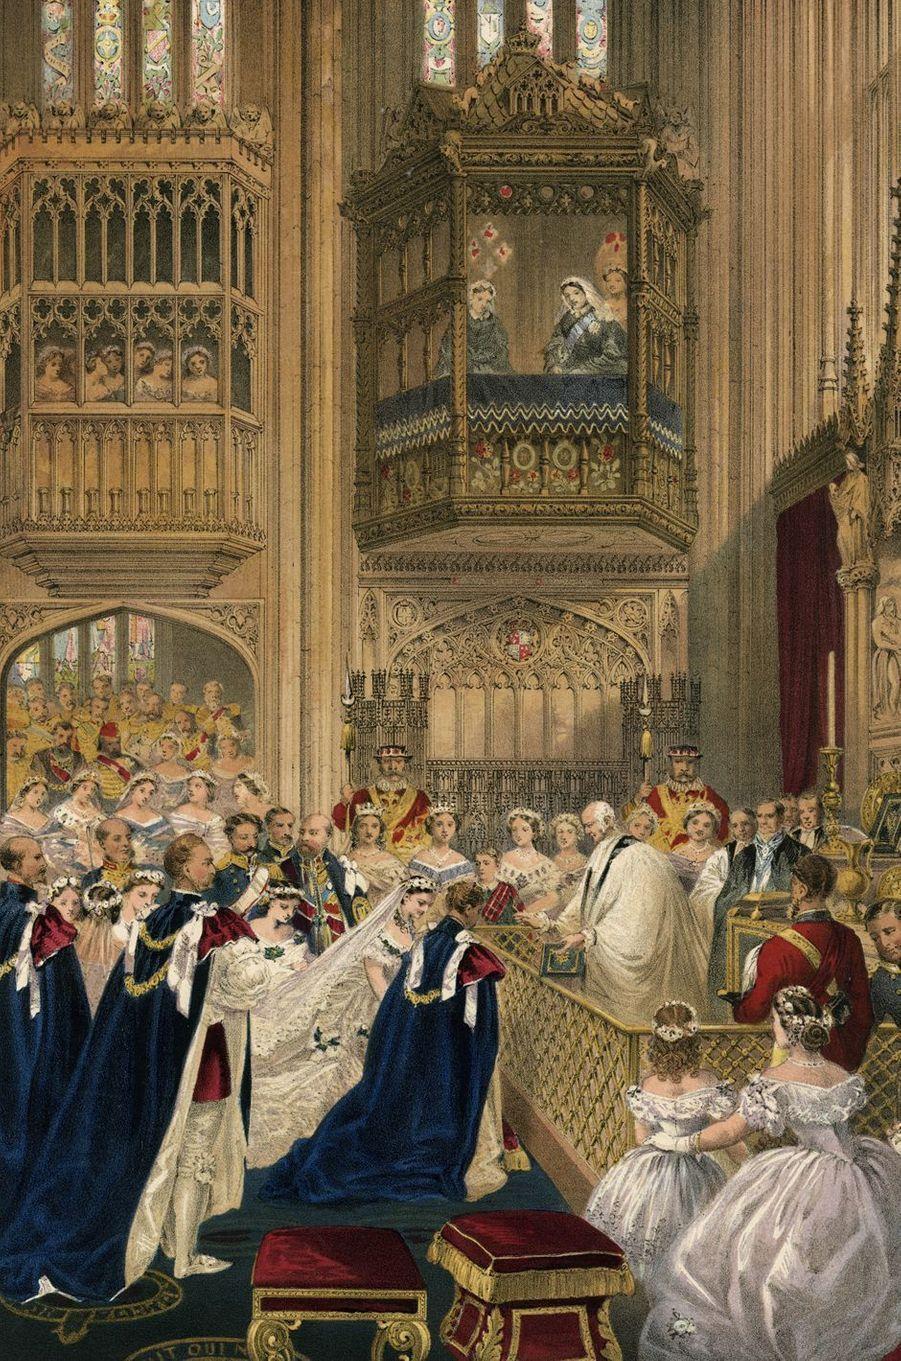 Mariage du prince Albert (fils de la reine Victoria, futur roi Edward VII) et de la princesse Alexandra de Danemark, le 10 mars 1863